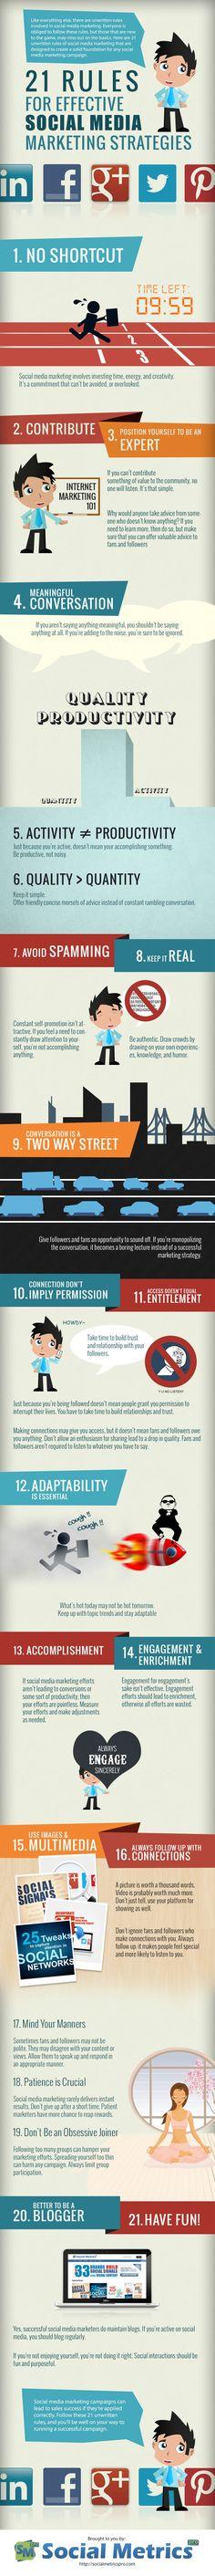 Infographic: 21 Rules for Effective Social Media Strategies Inbound Marketing, Marketing Digital, Marketing Trends, Marketing En Internet, Marketing Online, Content Marketing, Social Media Marketing, Marketing Strategies, Marketing Tactics